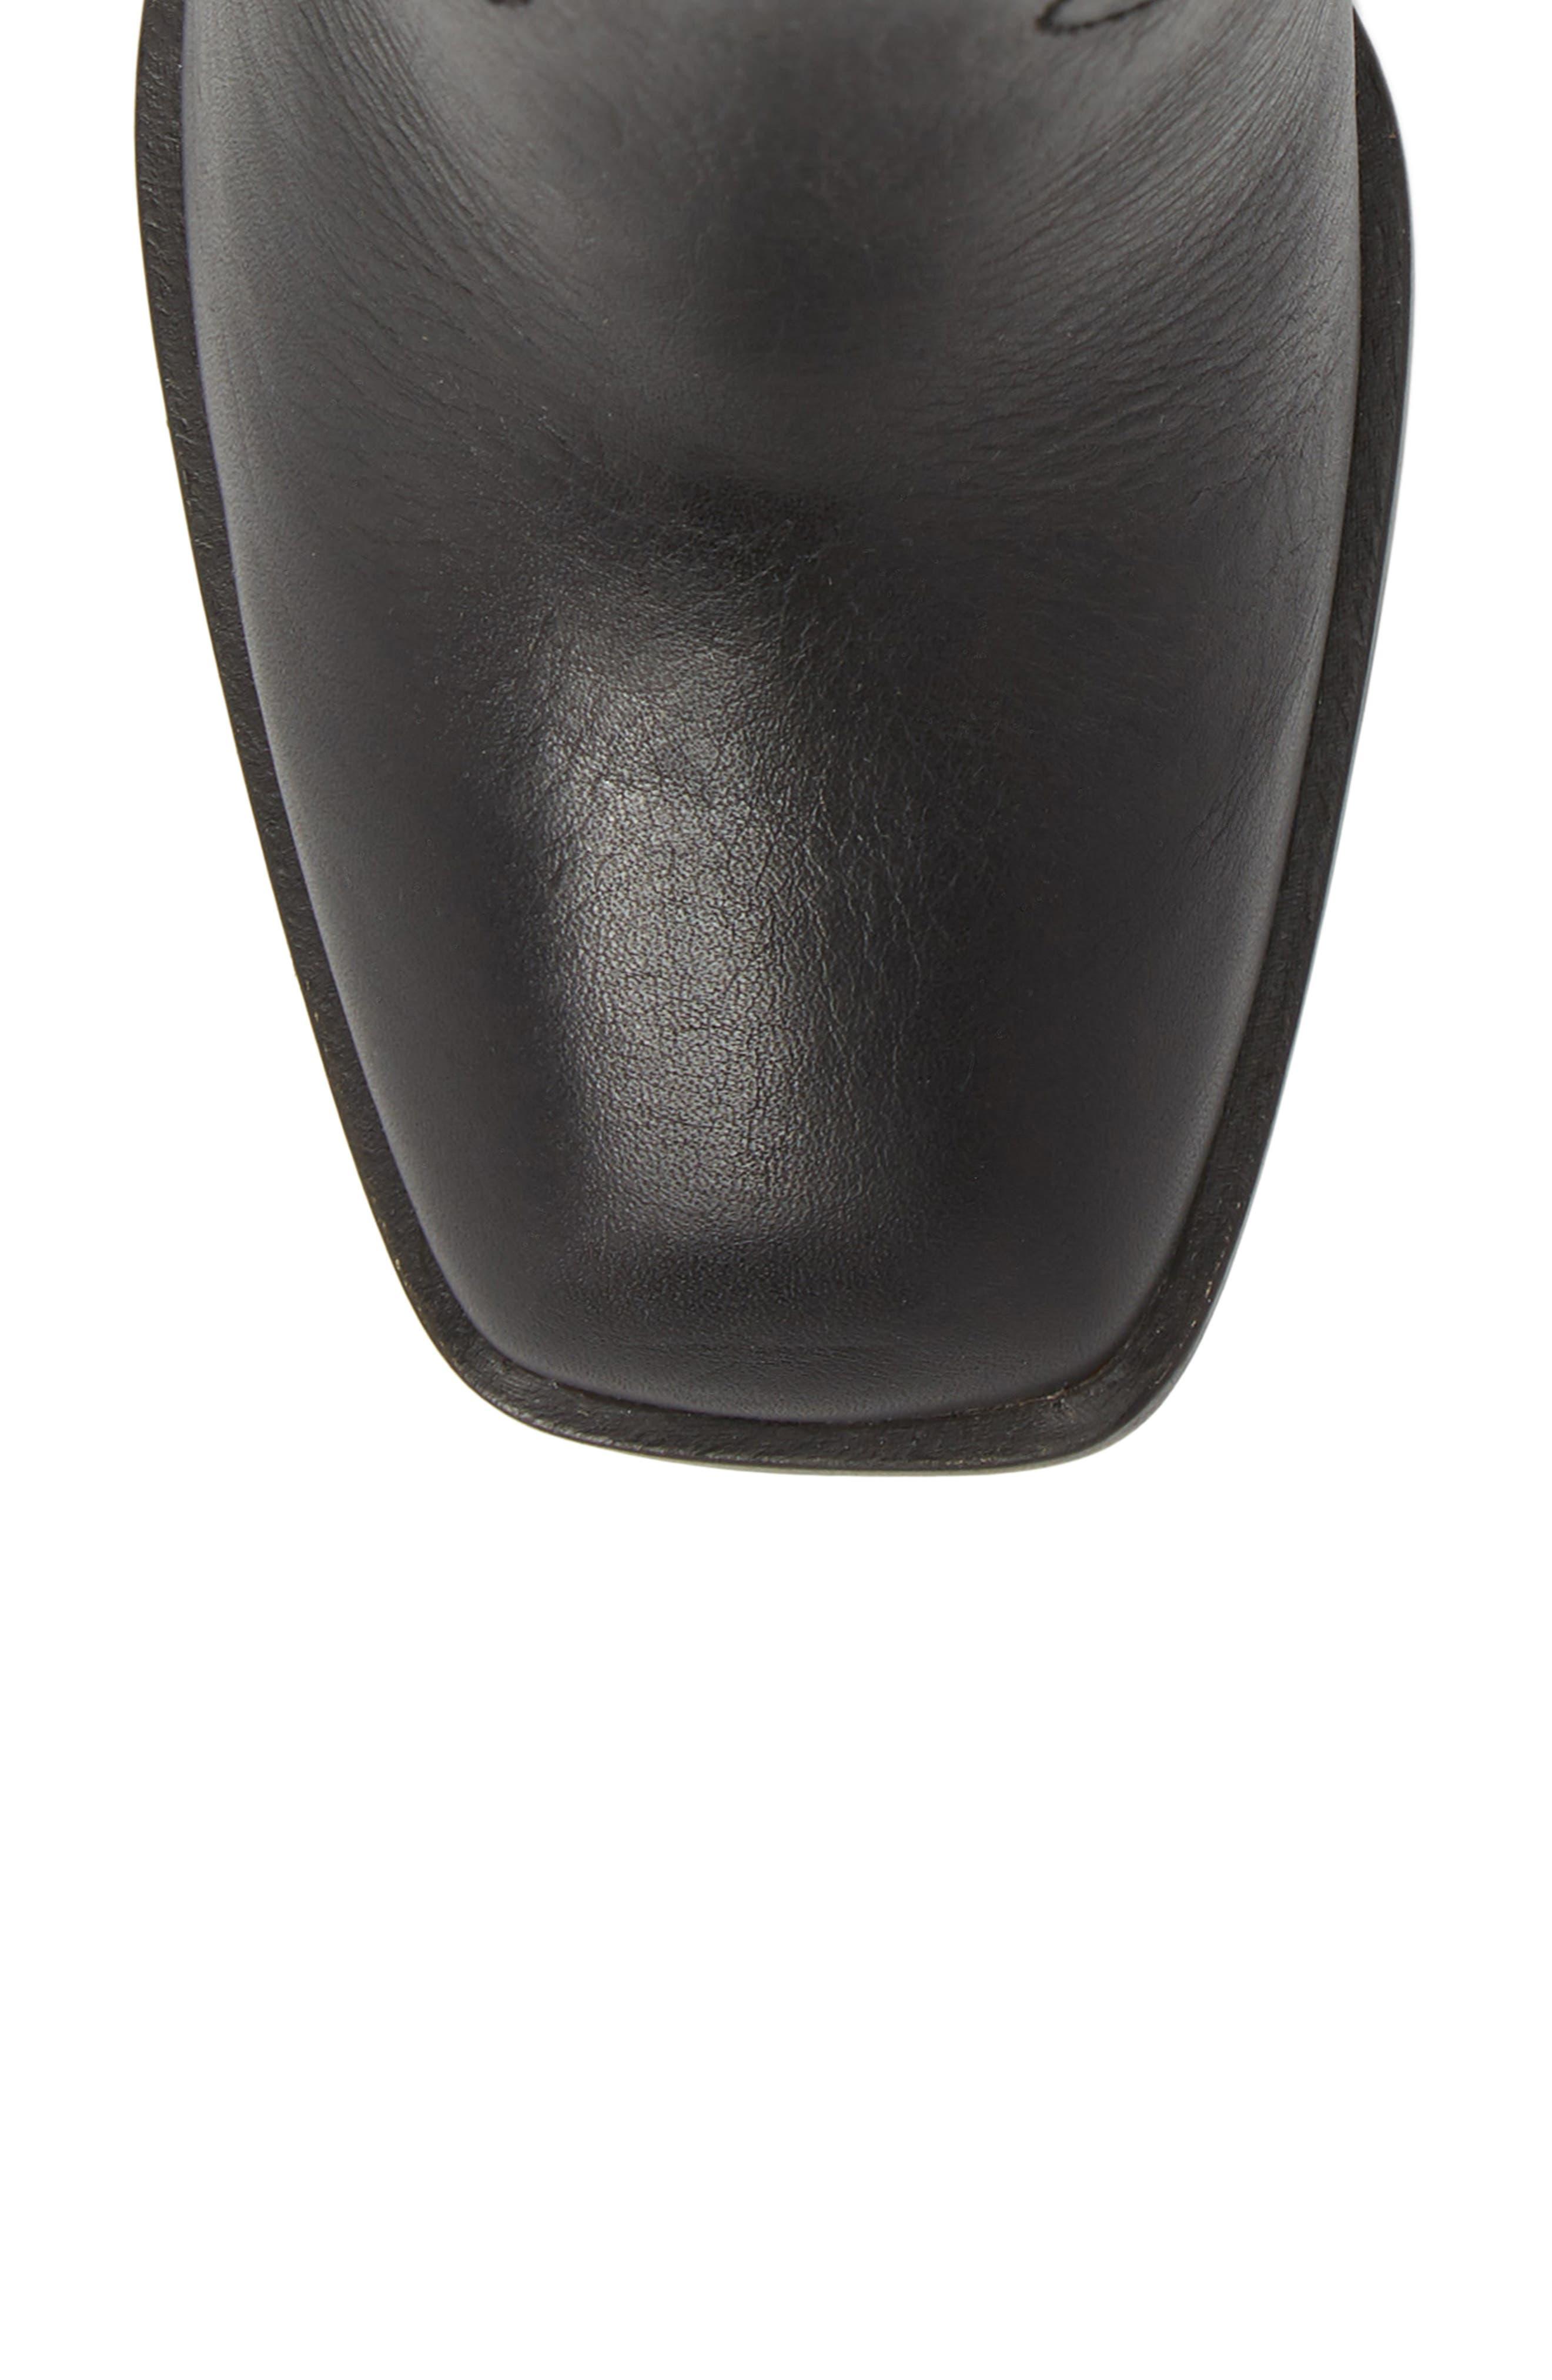 Nero Bootie,                             Alternate thumbnail 5, color,                             Black Leather